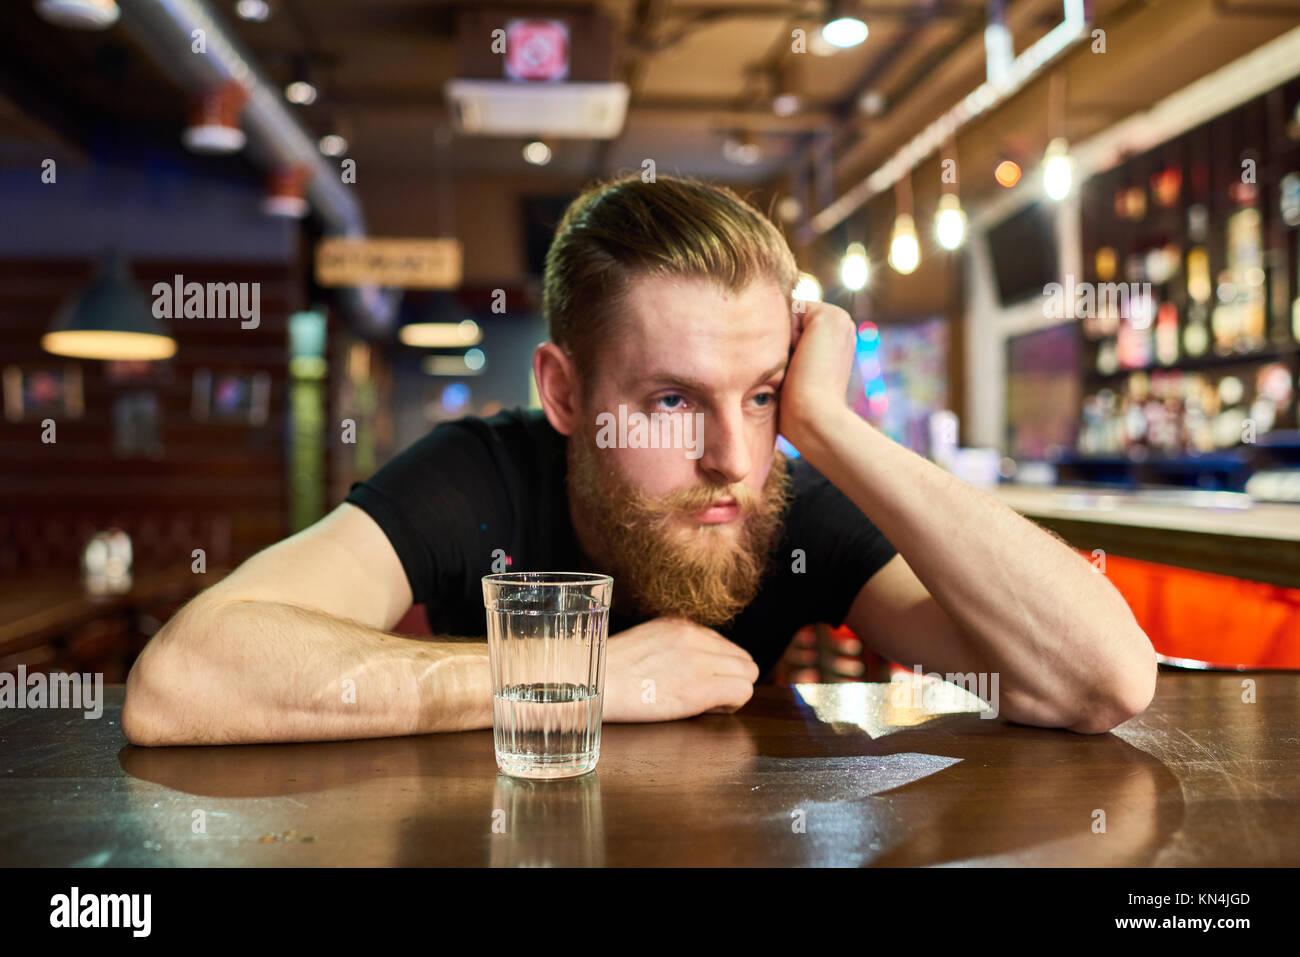 Triste Homme barbu se saouler en Bar Photo Stock